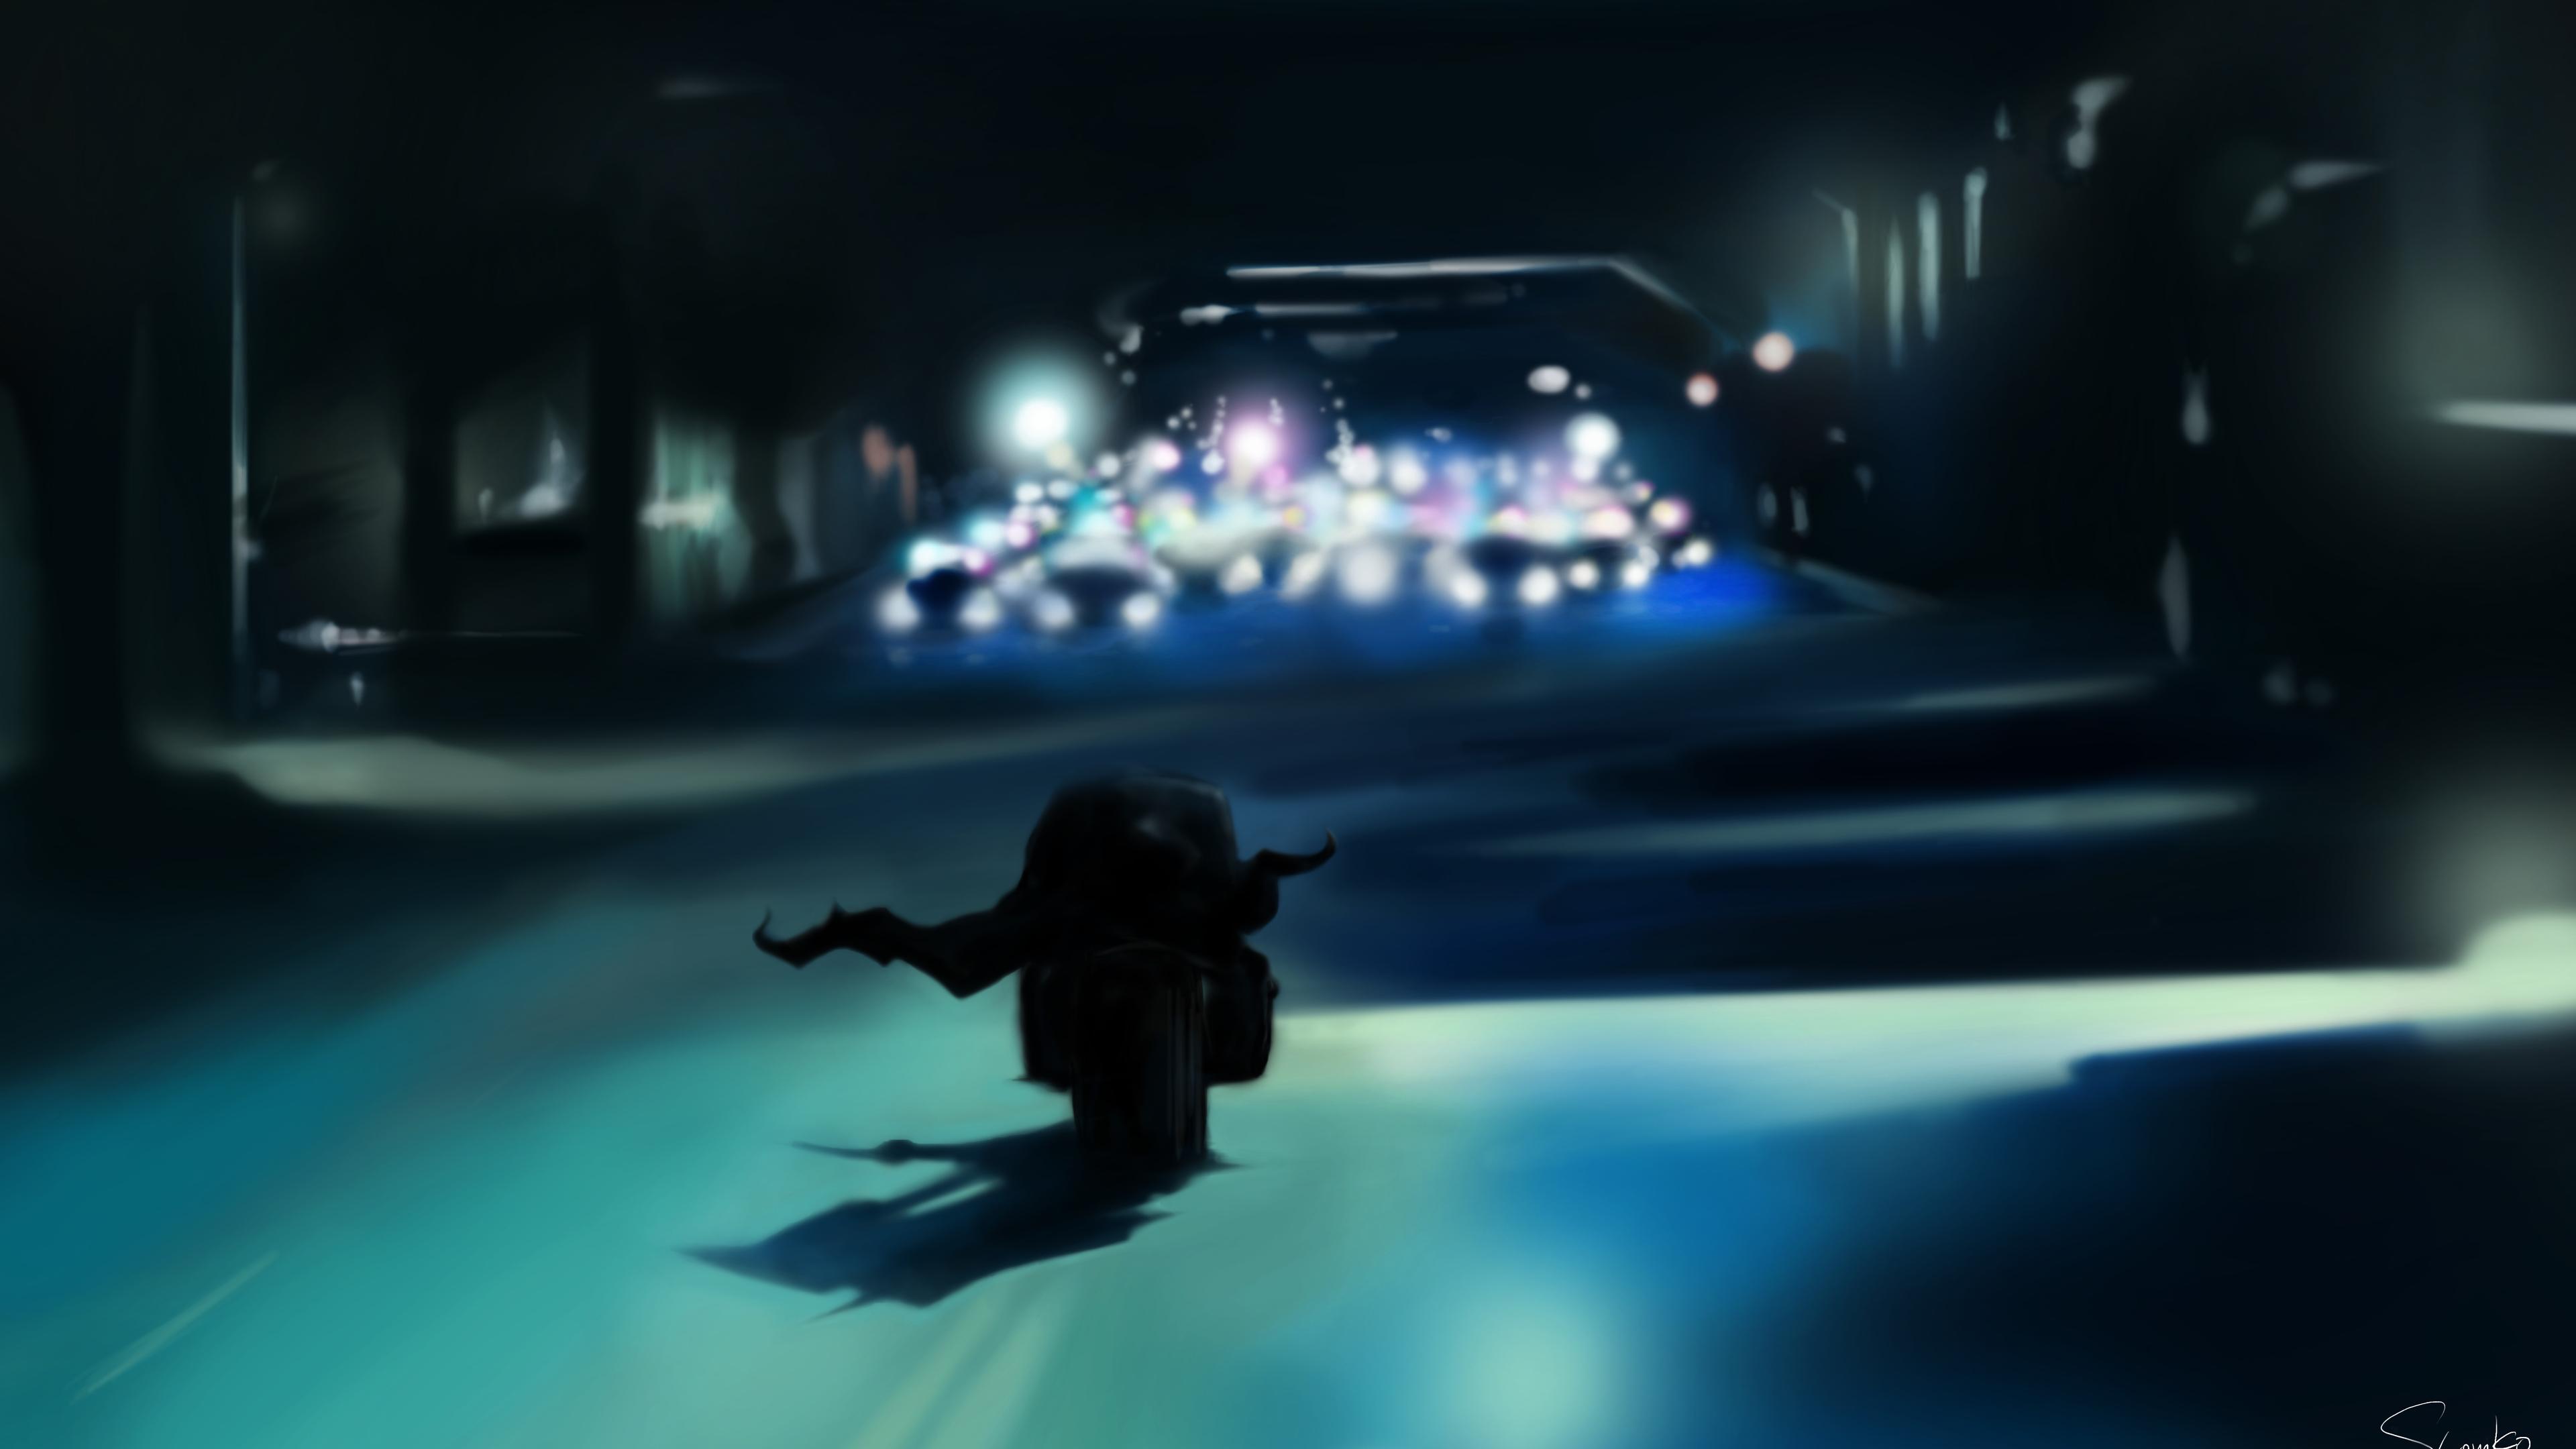 the dark knight and the cops 1536522732 - The Dark Knight And The Cops - hd-wallpapers, digital art wallpapers, deviantart wallpapers, batman wallpapers, artwork wallpapers, artist wallpapers, 5k wallpapers, 4k-wallpapers